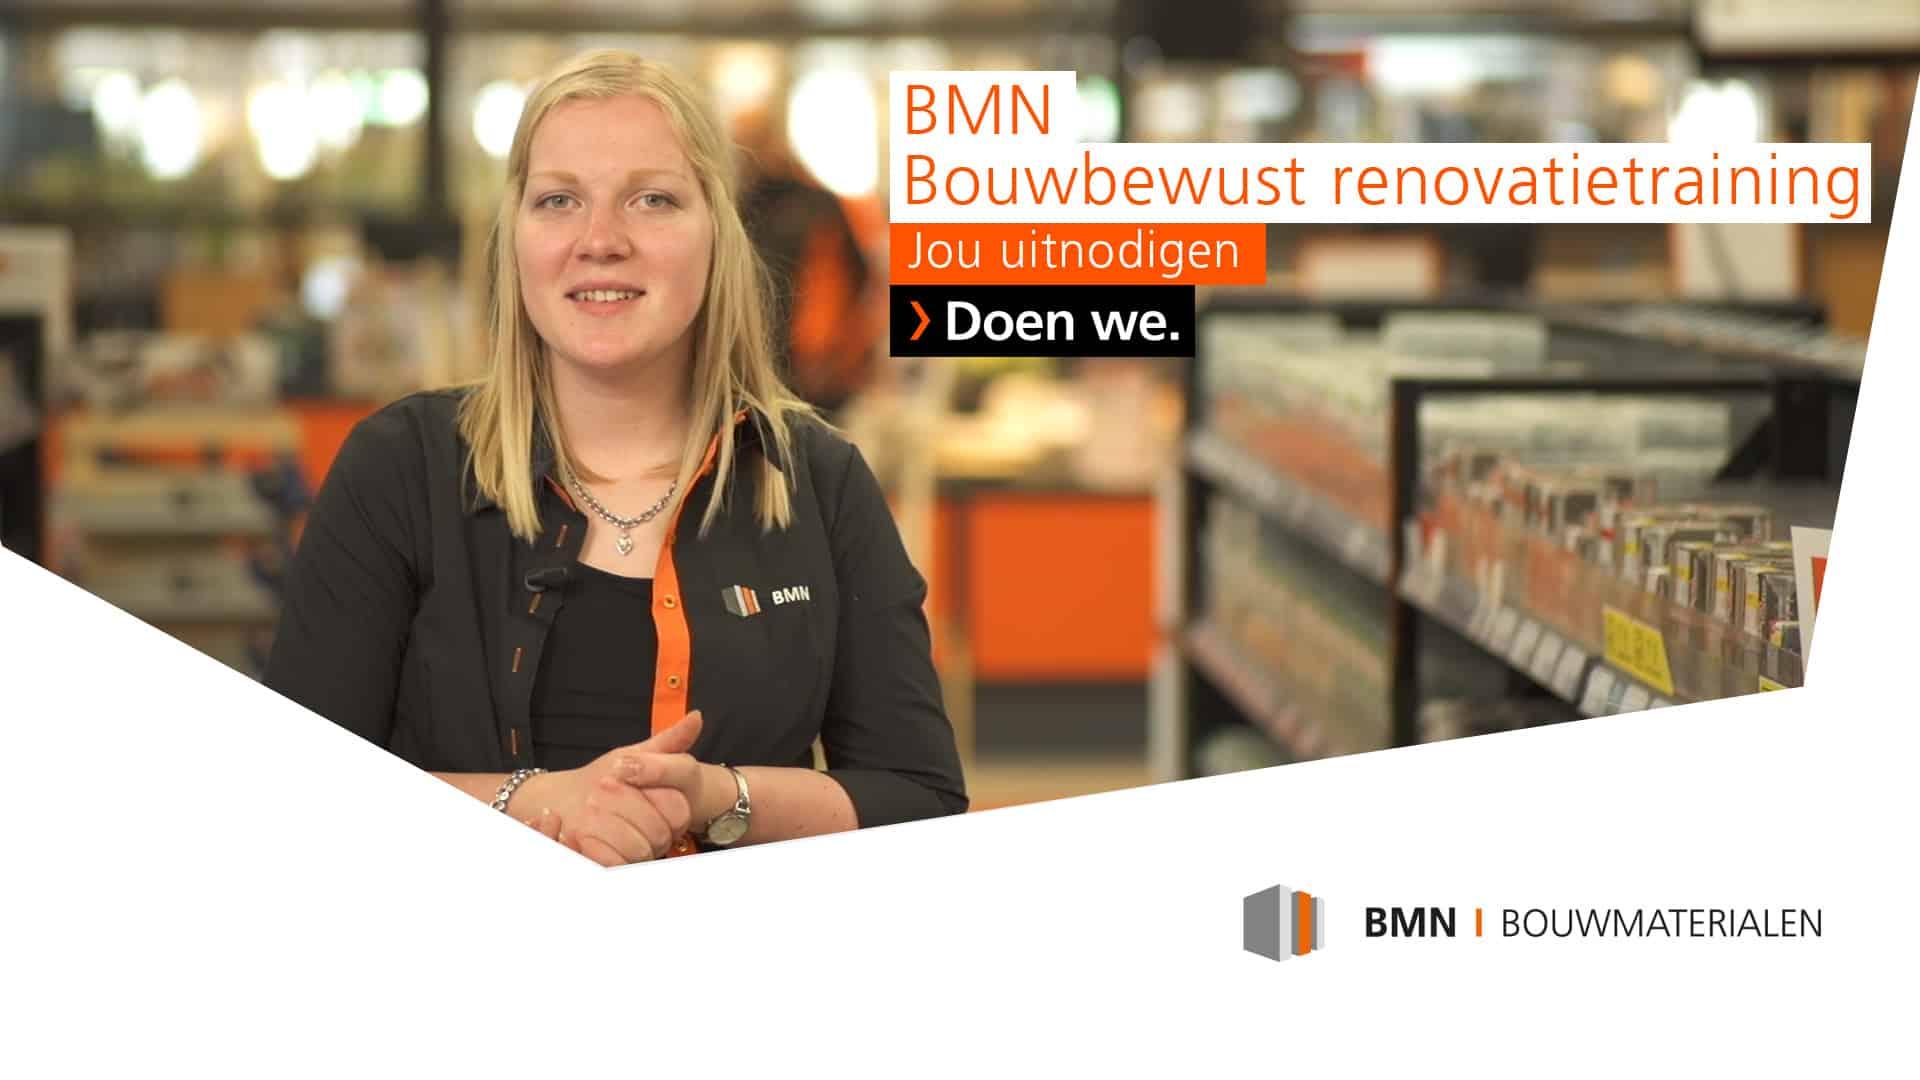 Thumbnail BMN -Bouwmaterialen - ZoomWorks - JPG